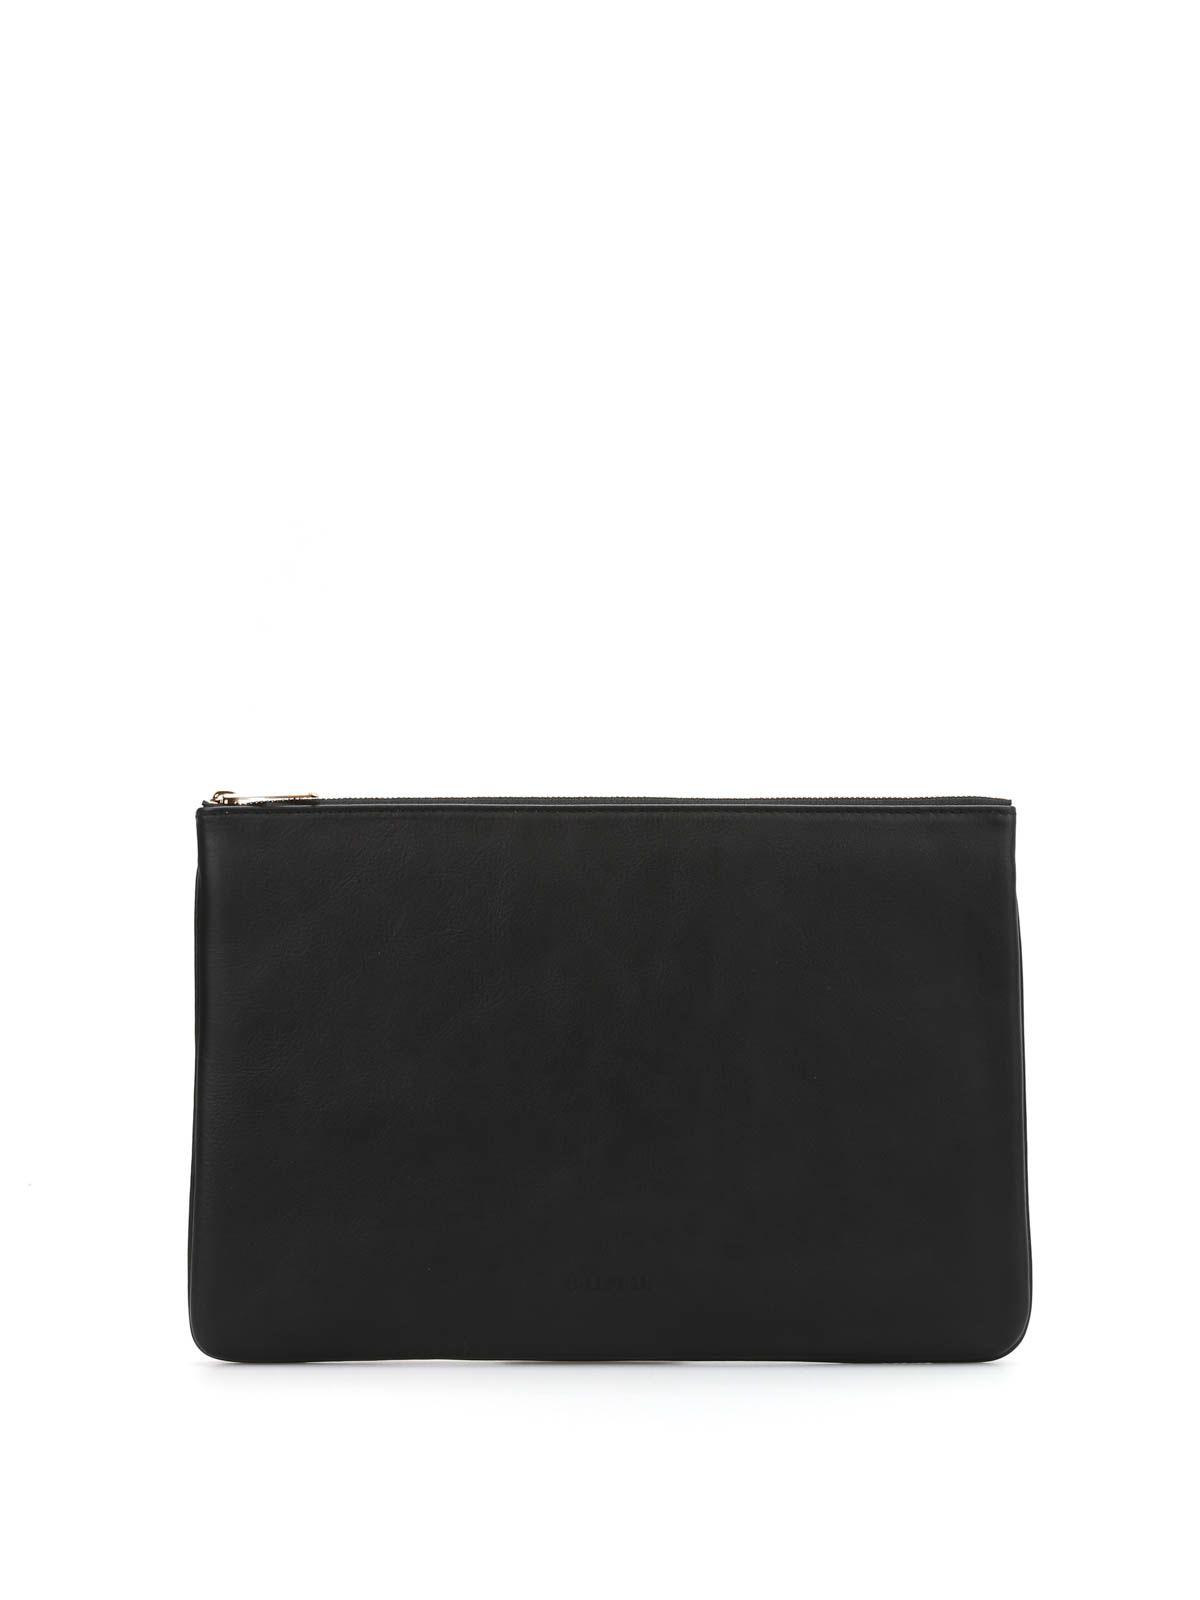 Pochette Handbag In Suede